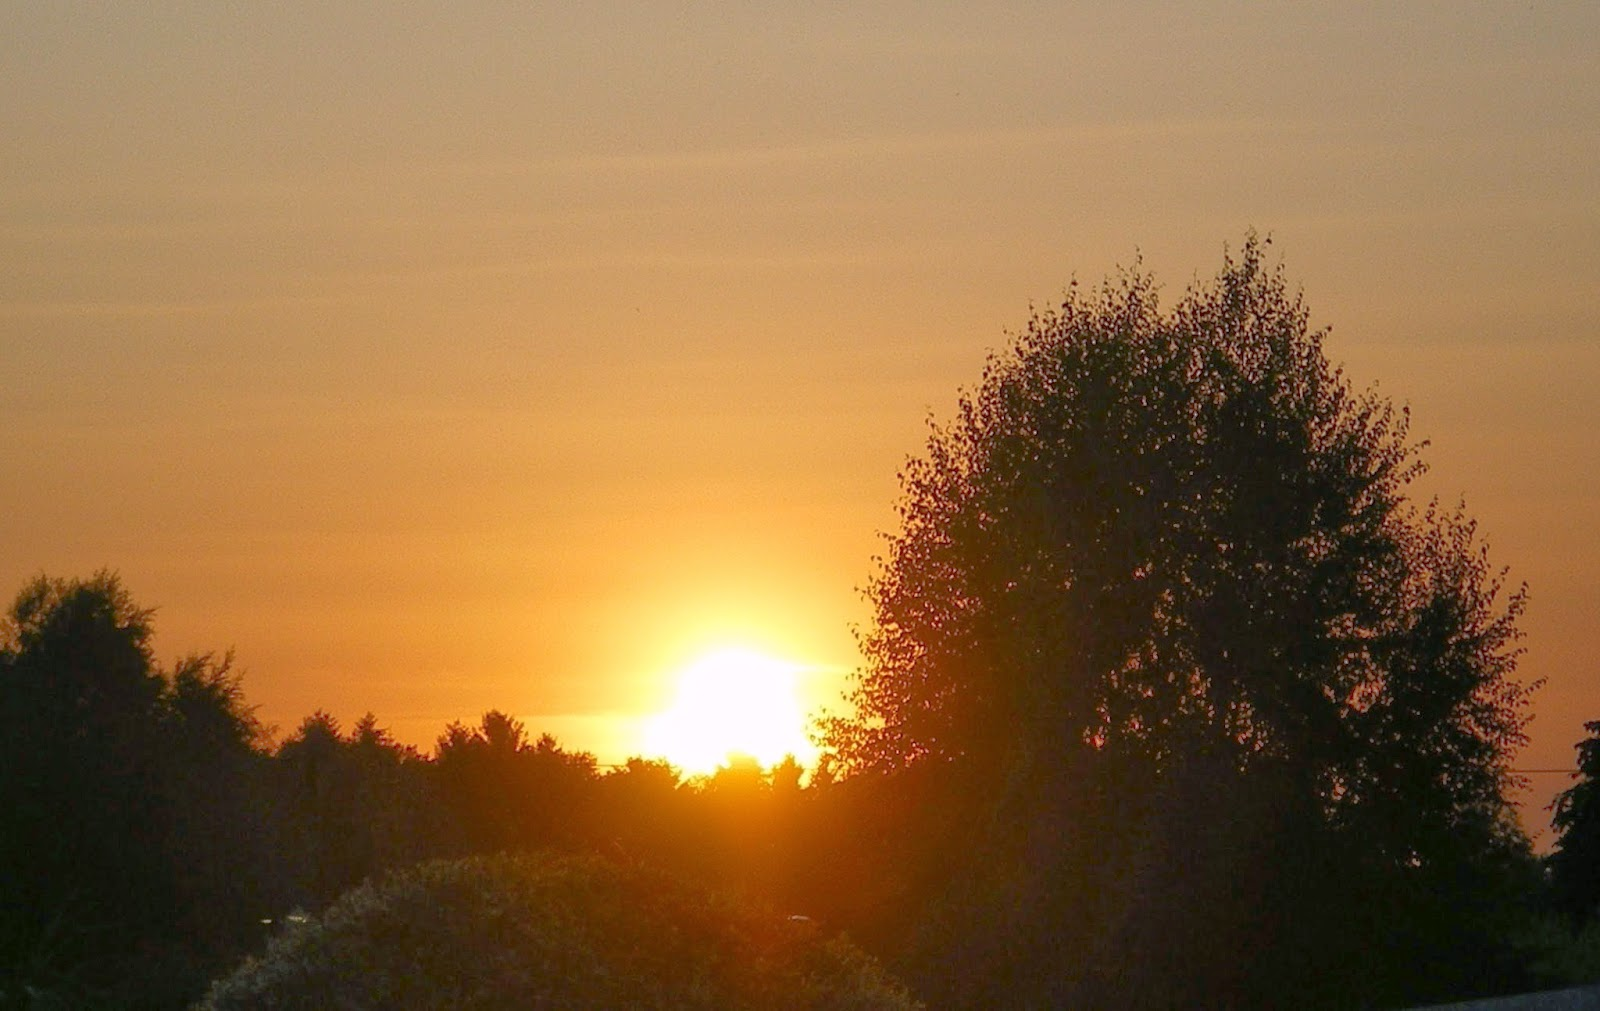 High Spirits Vor Sonnenuntergang Ube Vergebung